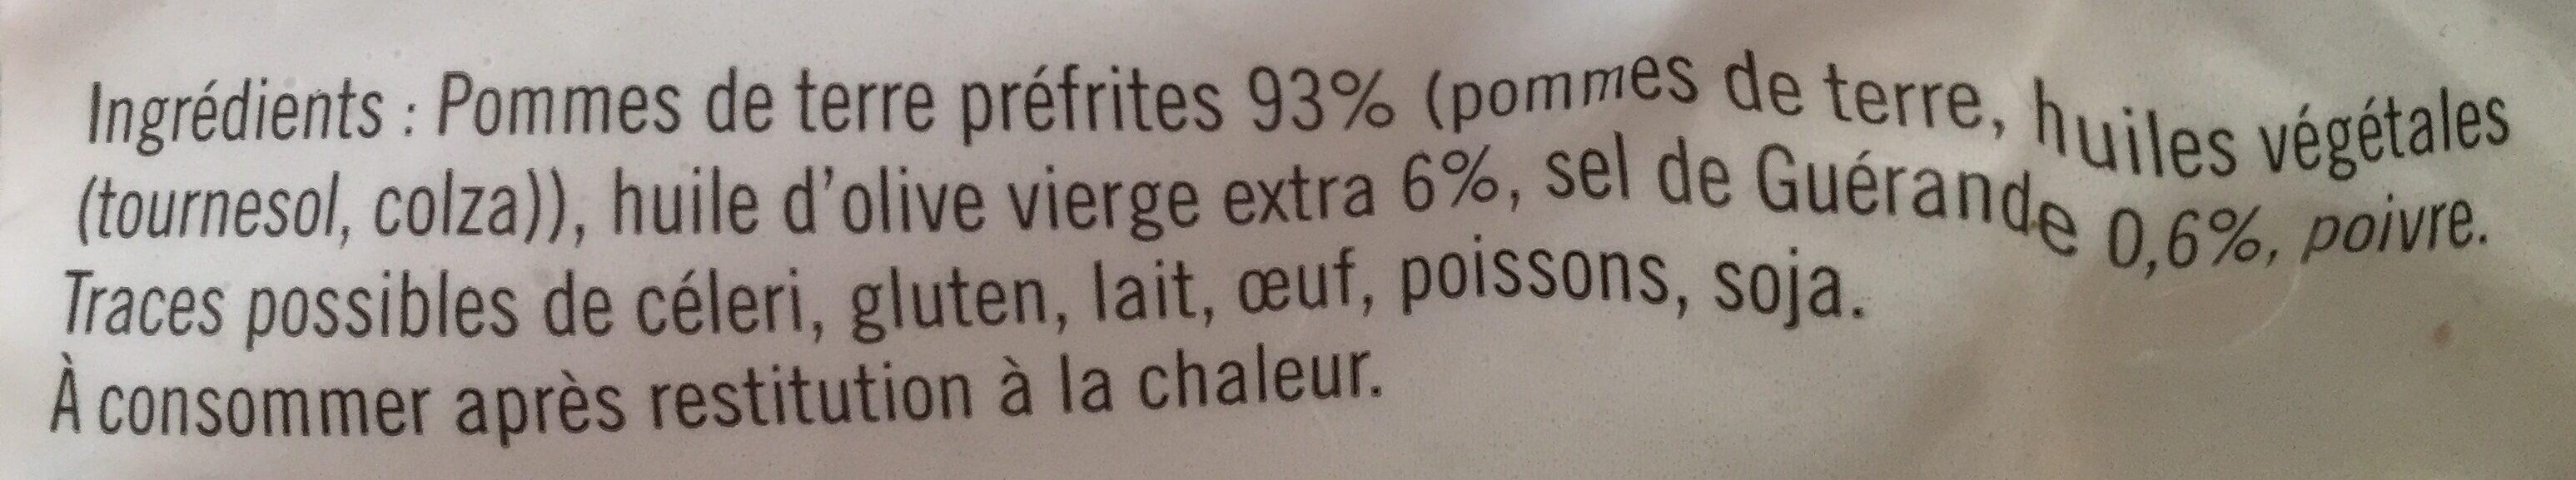 Poelee de pommes de terre Grenaille - Ingrediënten